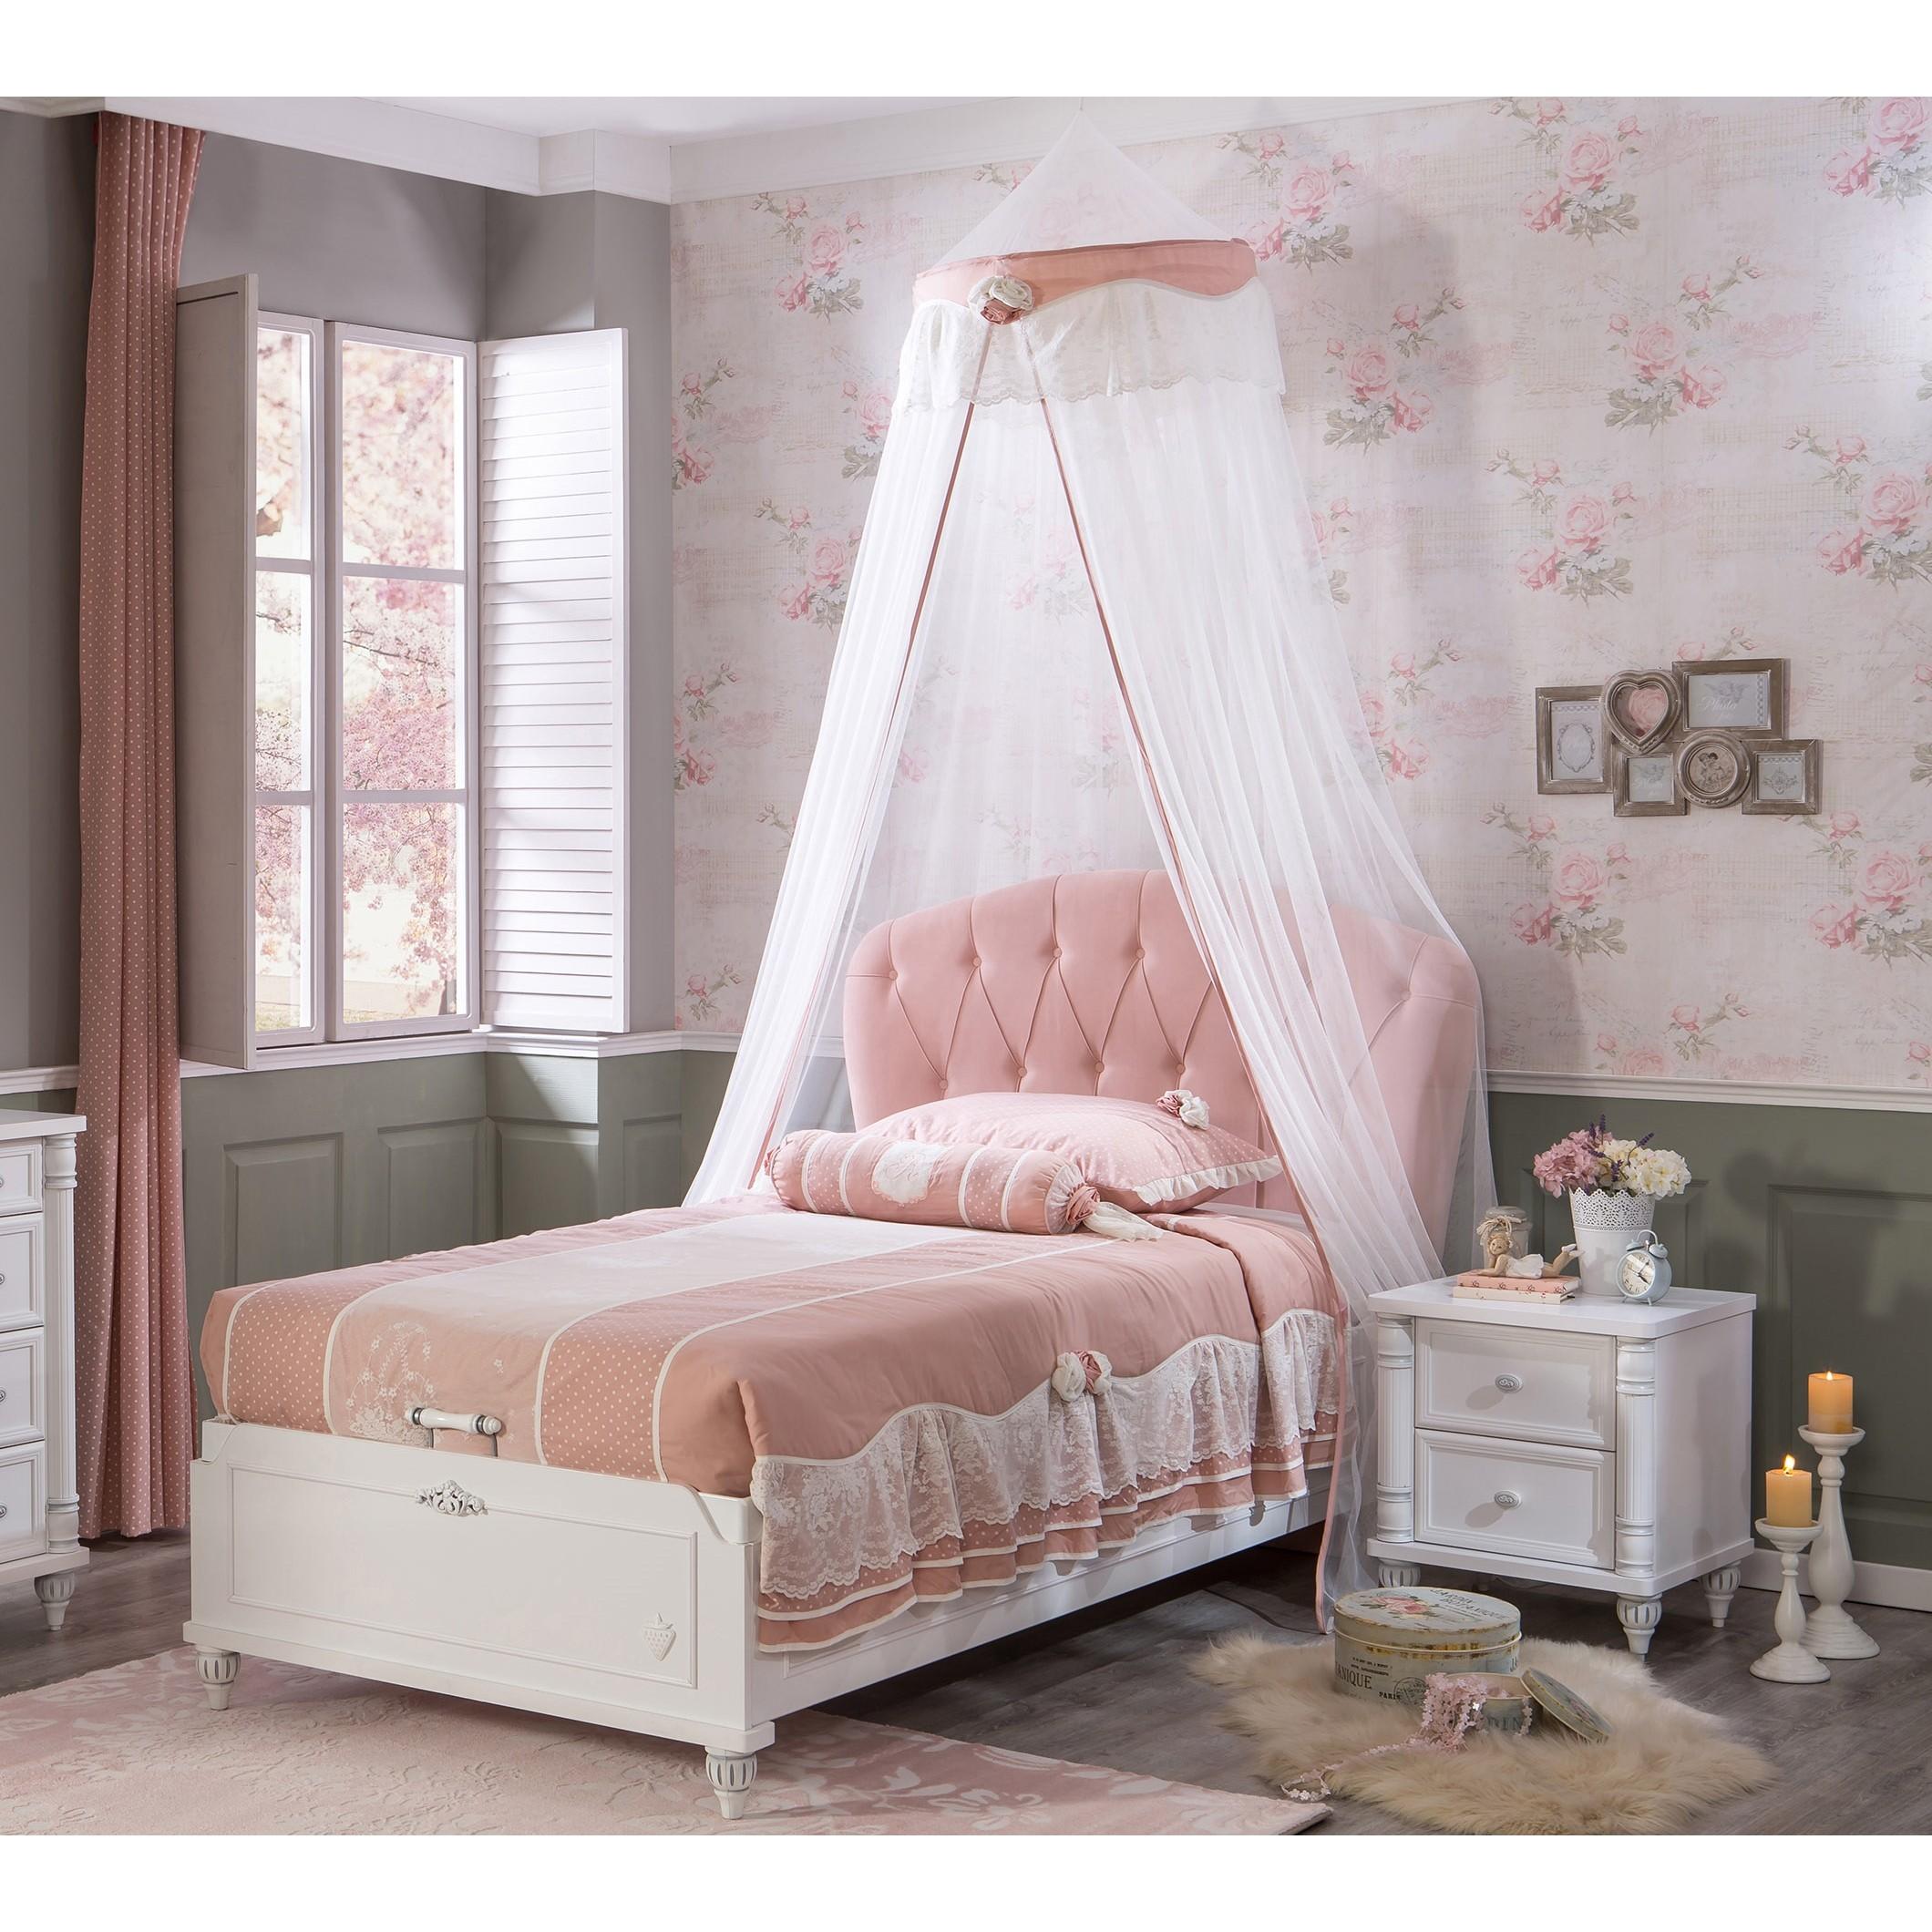 Witte sheer gordijn Romantic meisjeskamer Kinderkamer, kinderbed ...